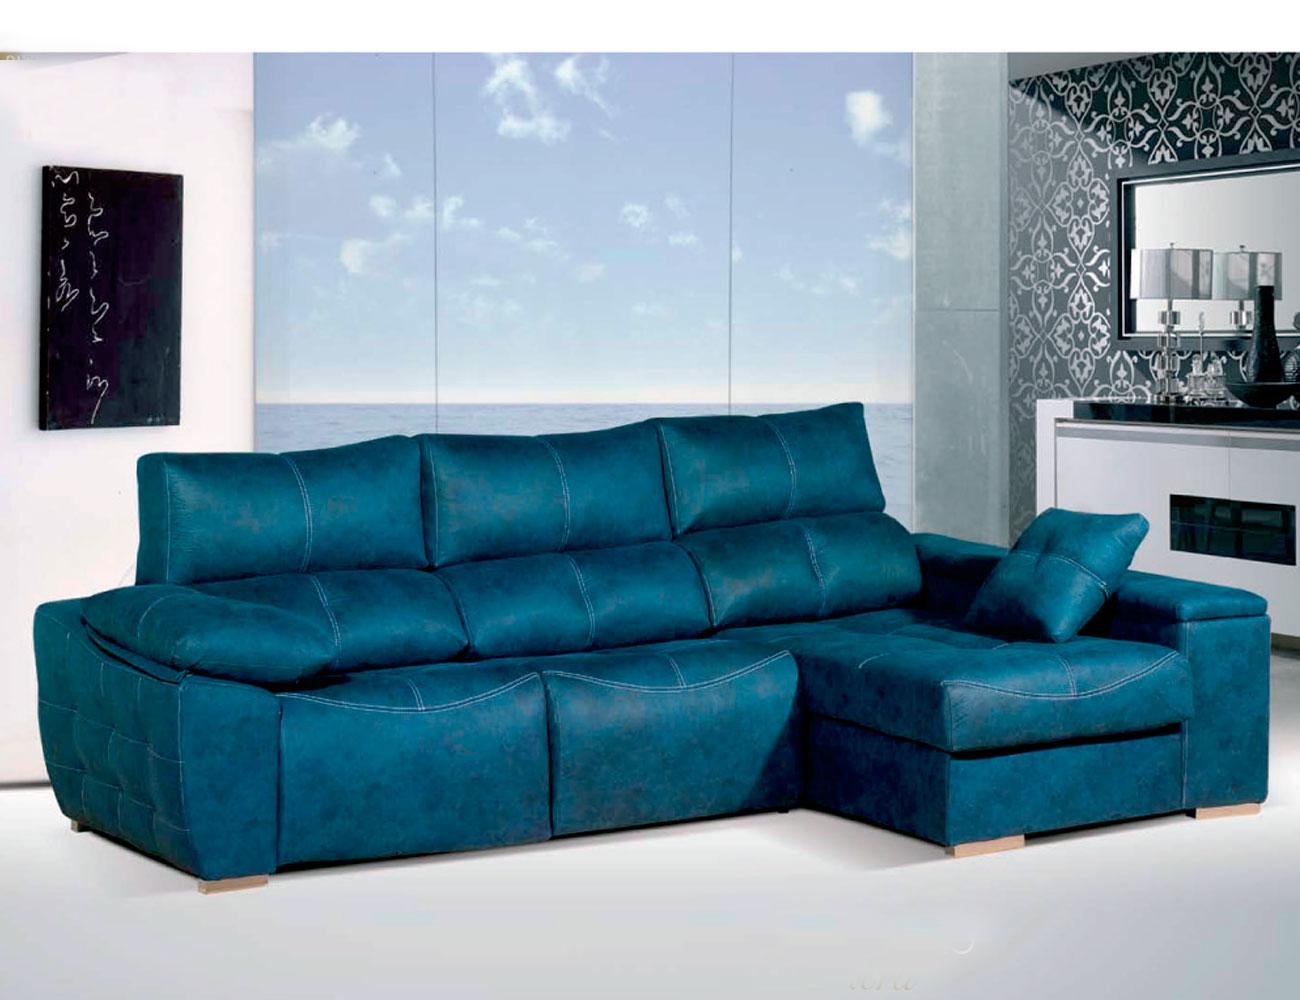 Sofa chaiselongue relax 2 motores anti manchas turquesa38